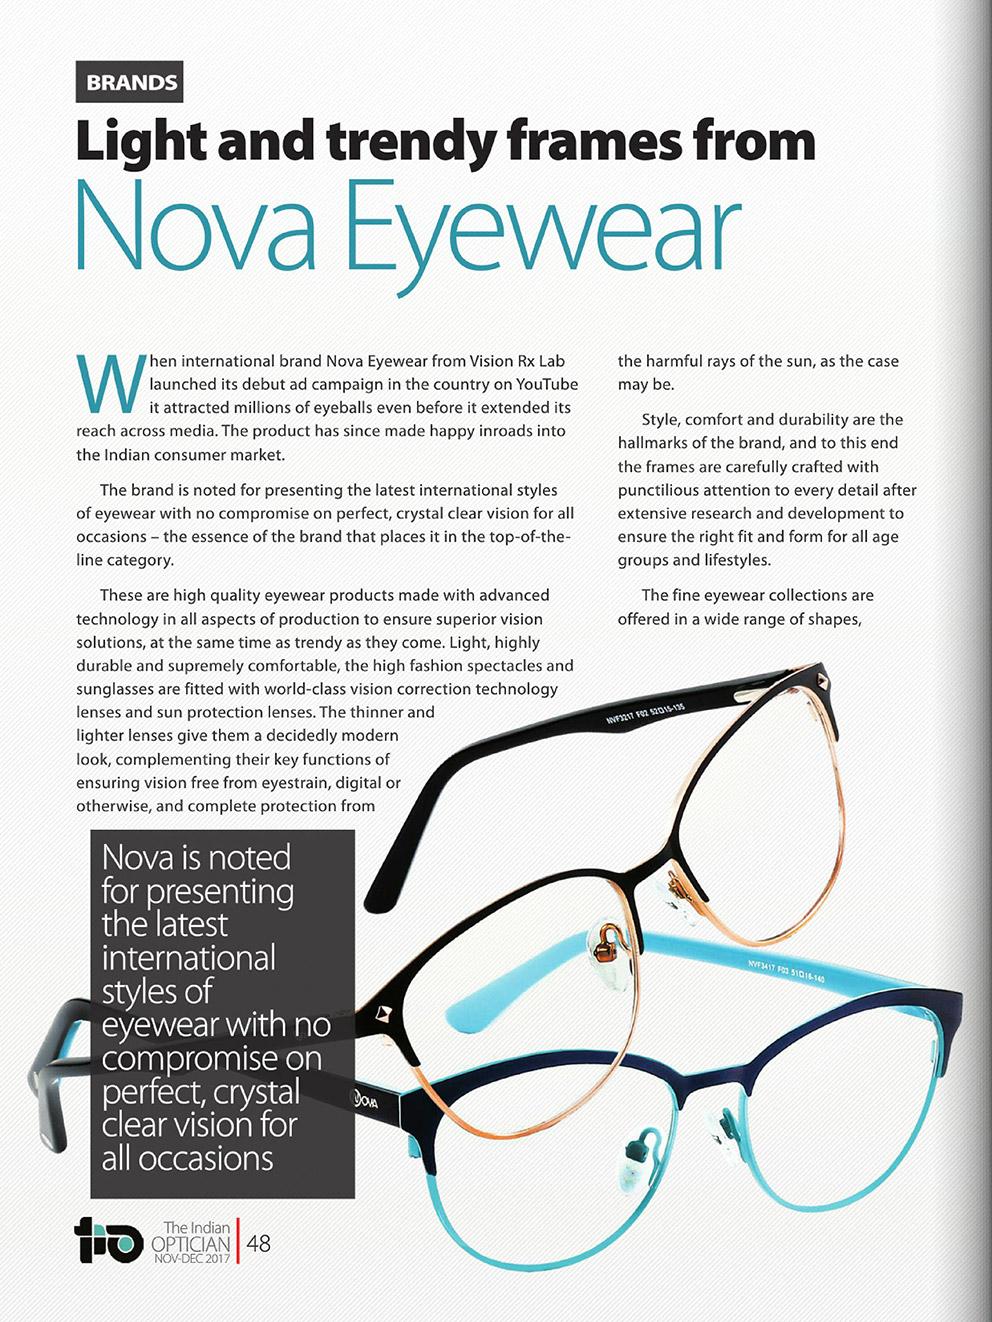 Light and trendy frames from Nova Eyewear